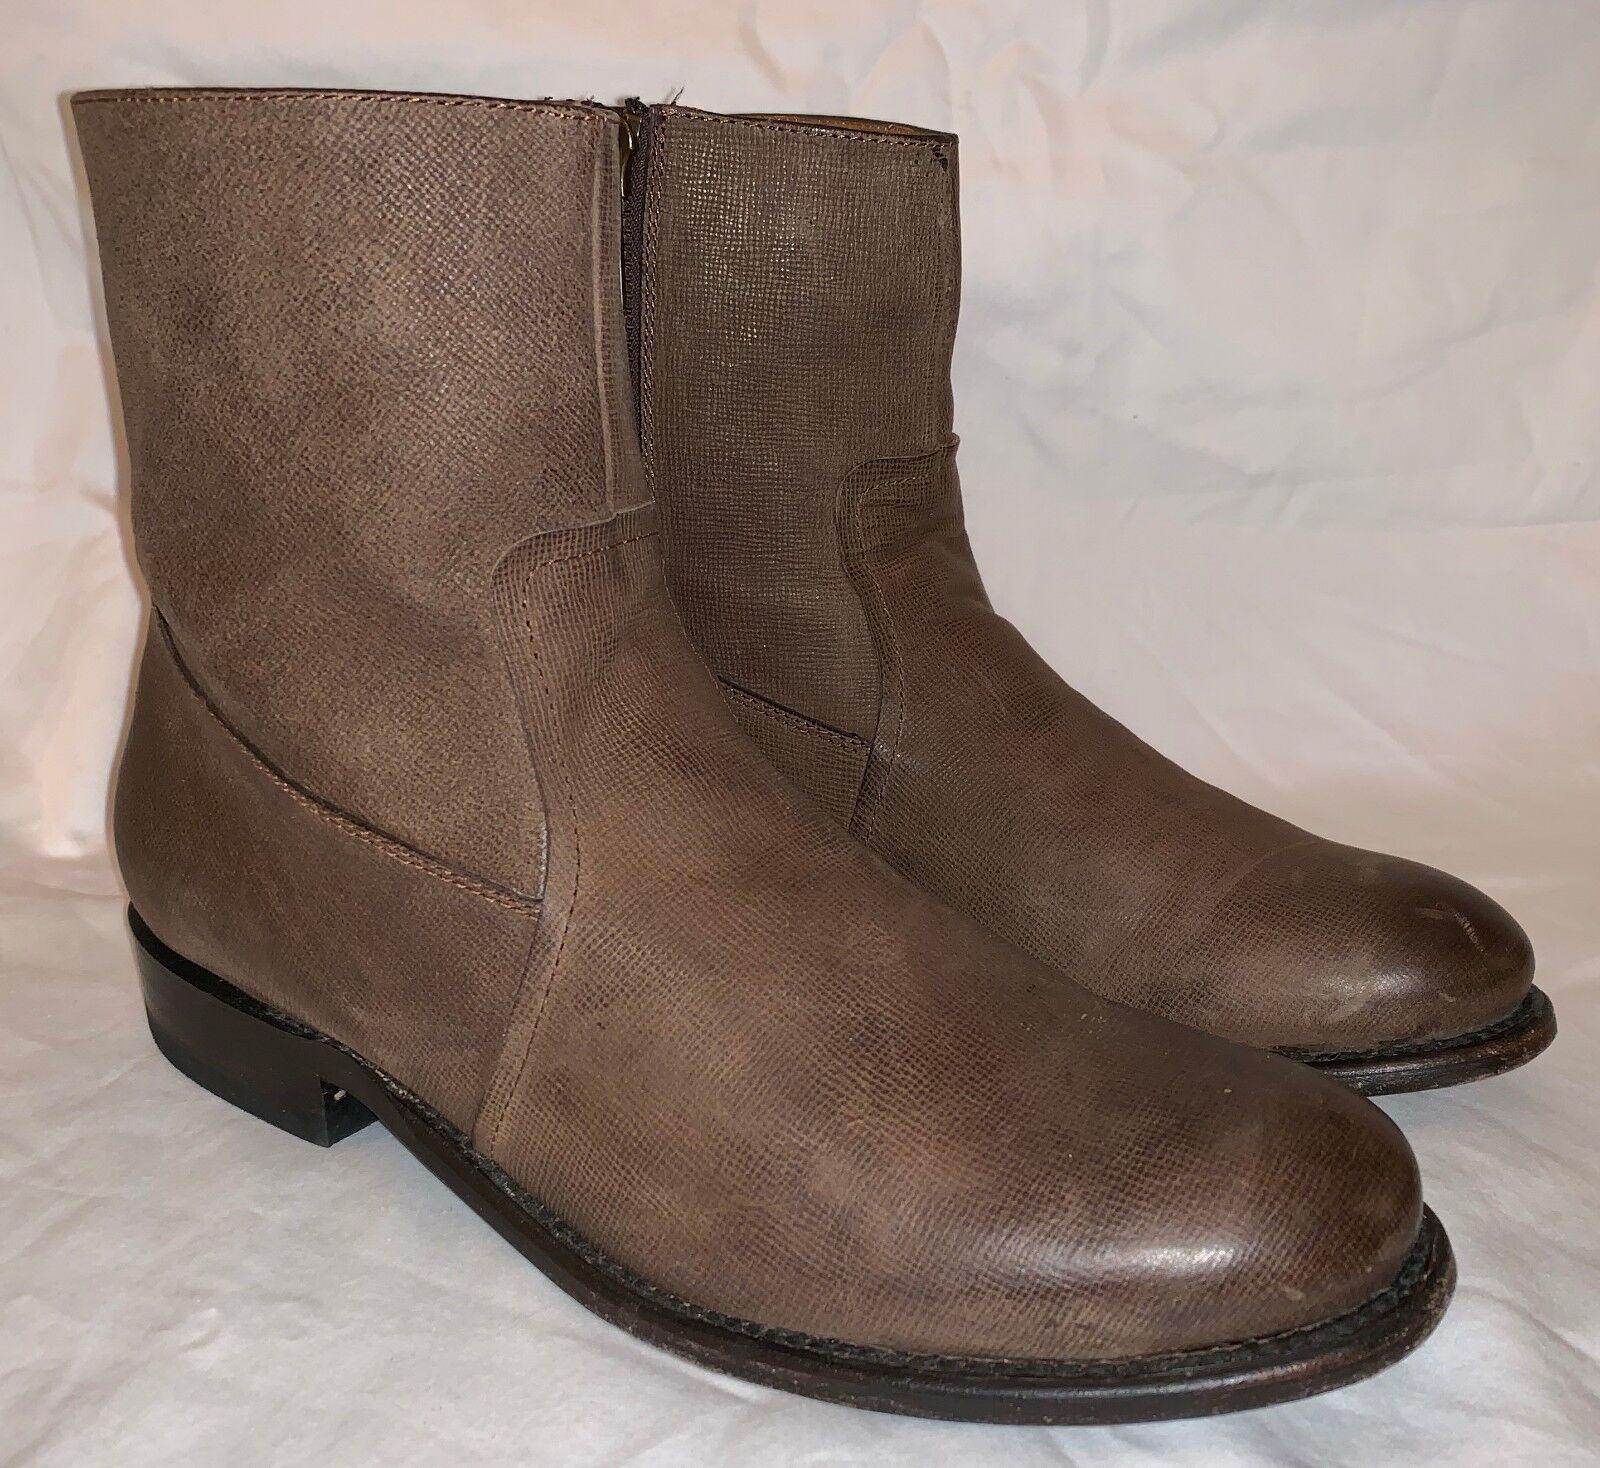 Mens 8.5 J.D. FISK Cowboy Western Brown Leather Side Zip Short Ankle Half Boots